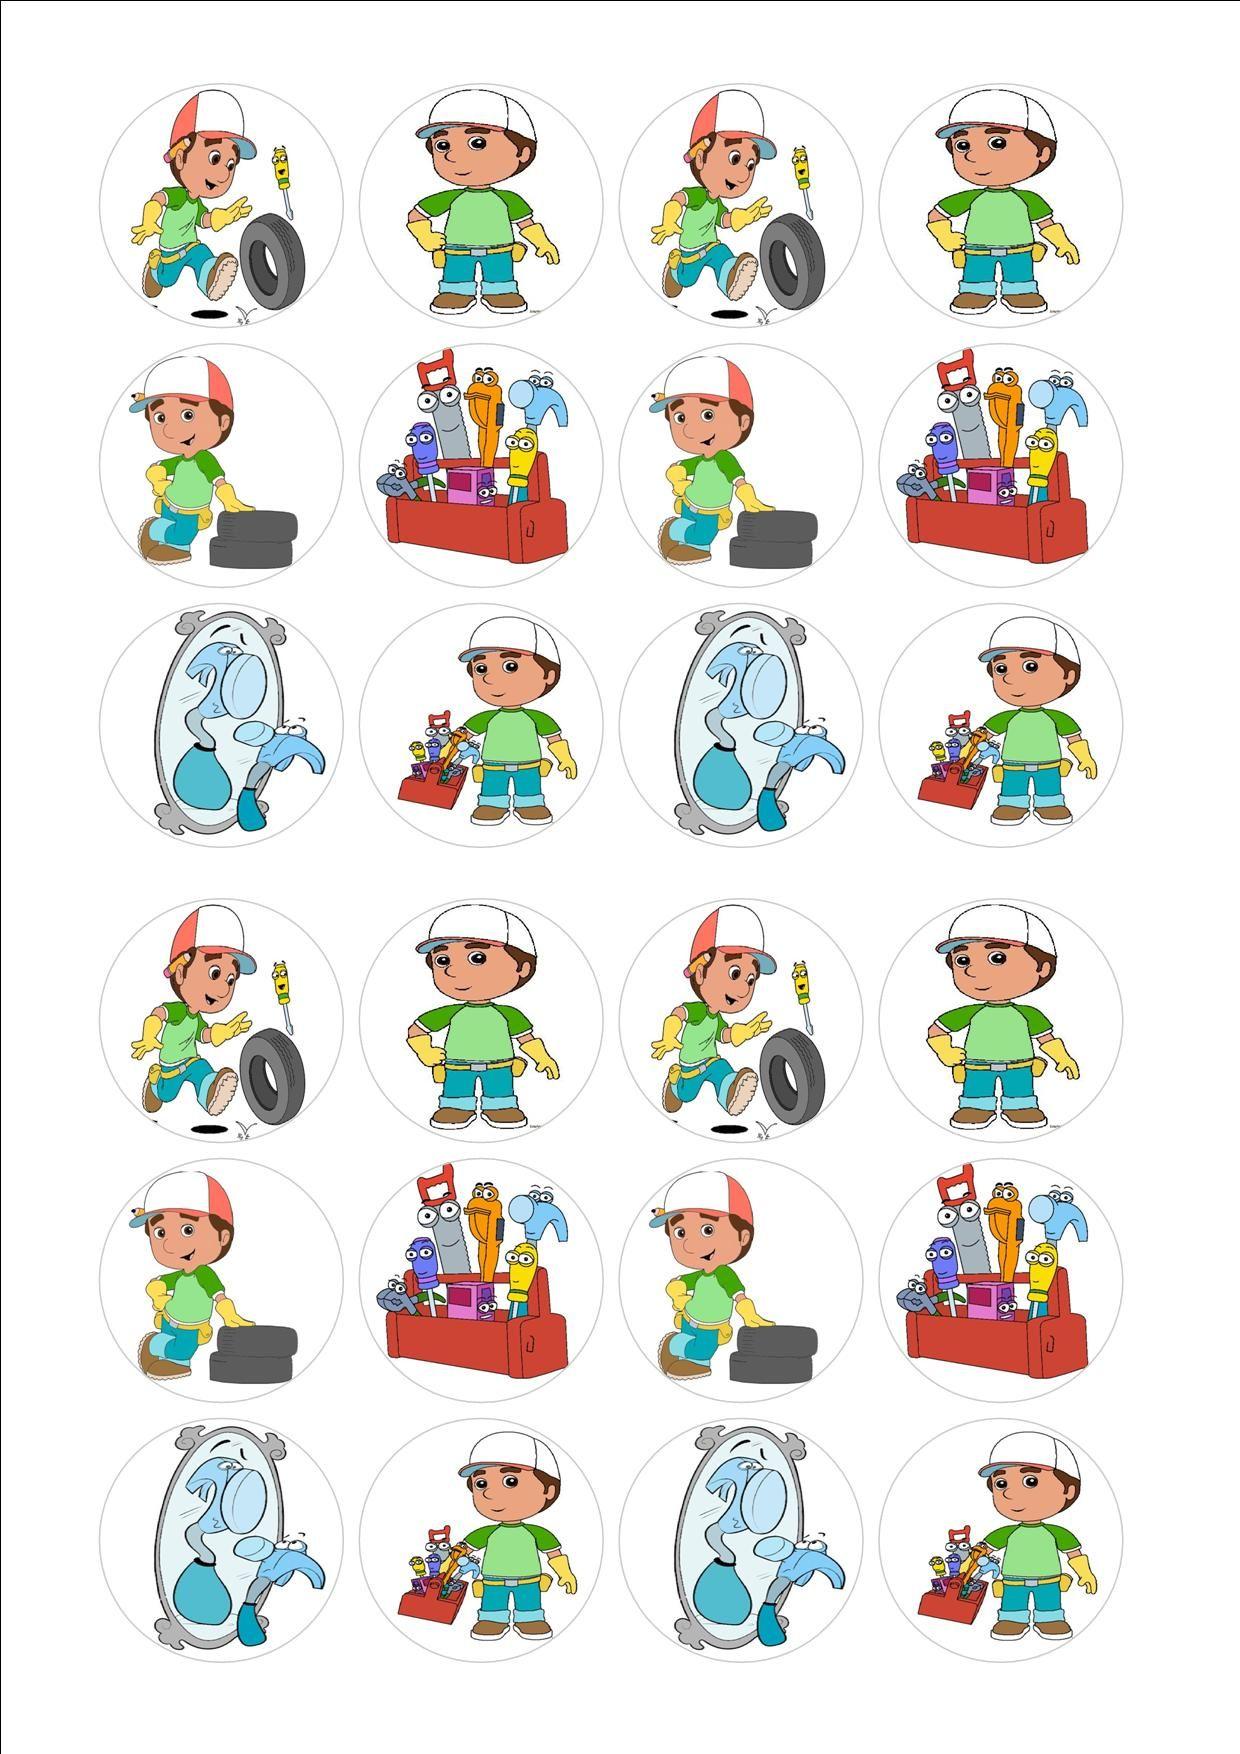 24 Handy Manny Jpg 1240 1754 Handy Manny Party Handy Manny Party Themes